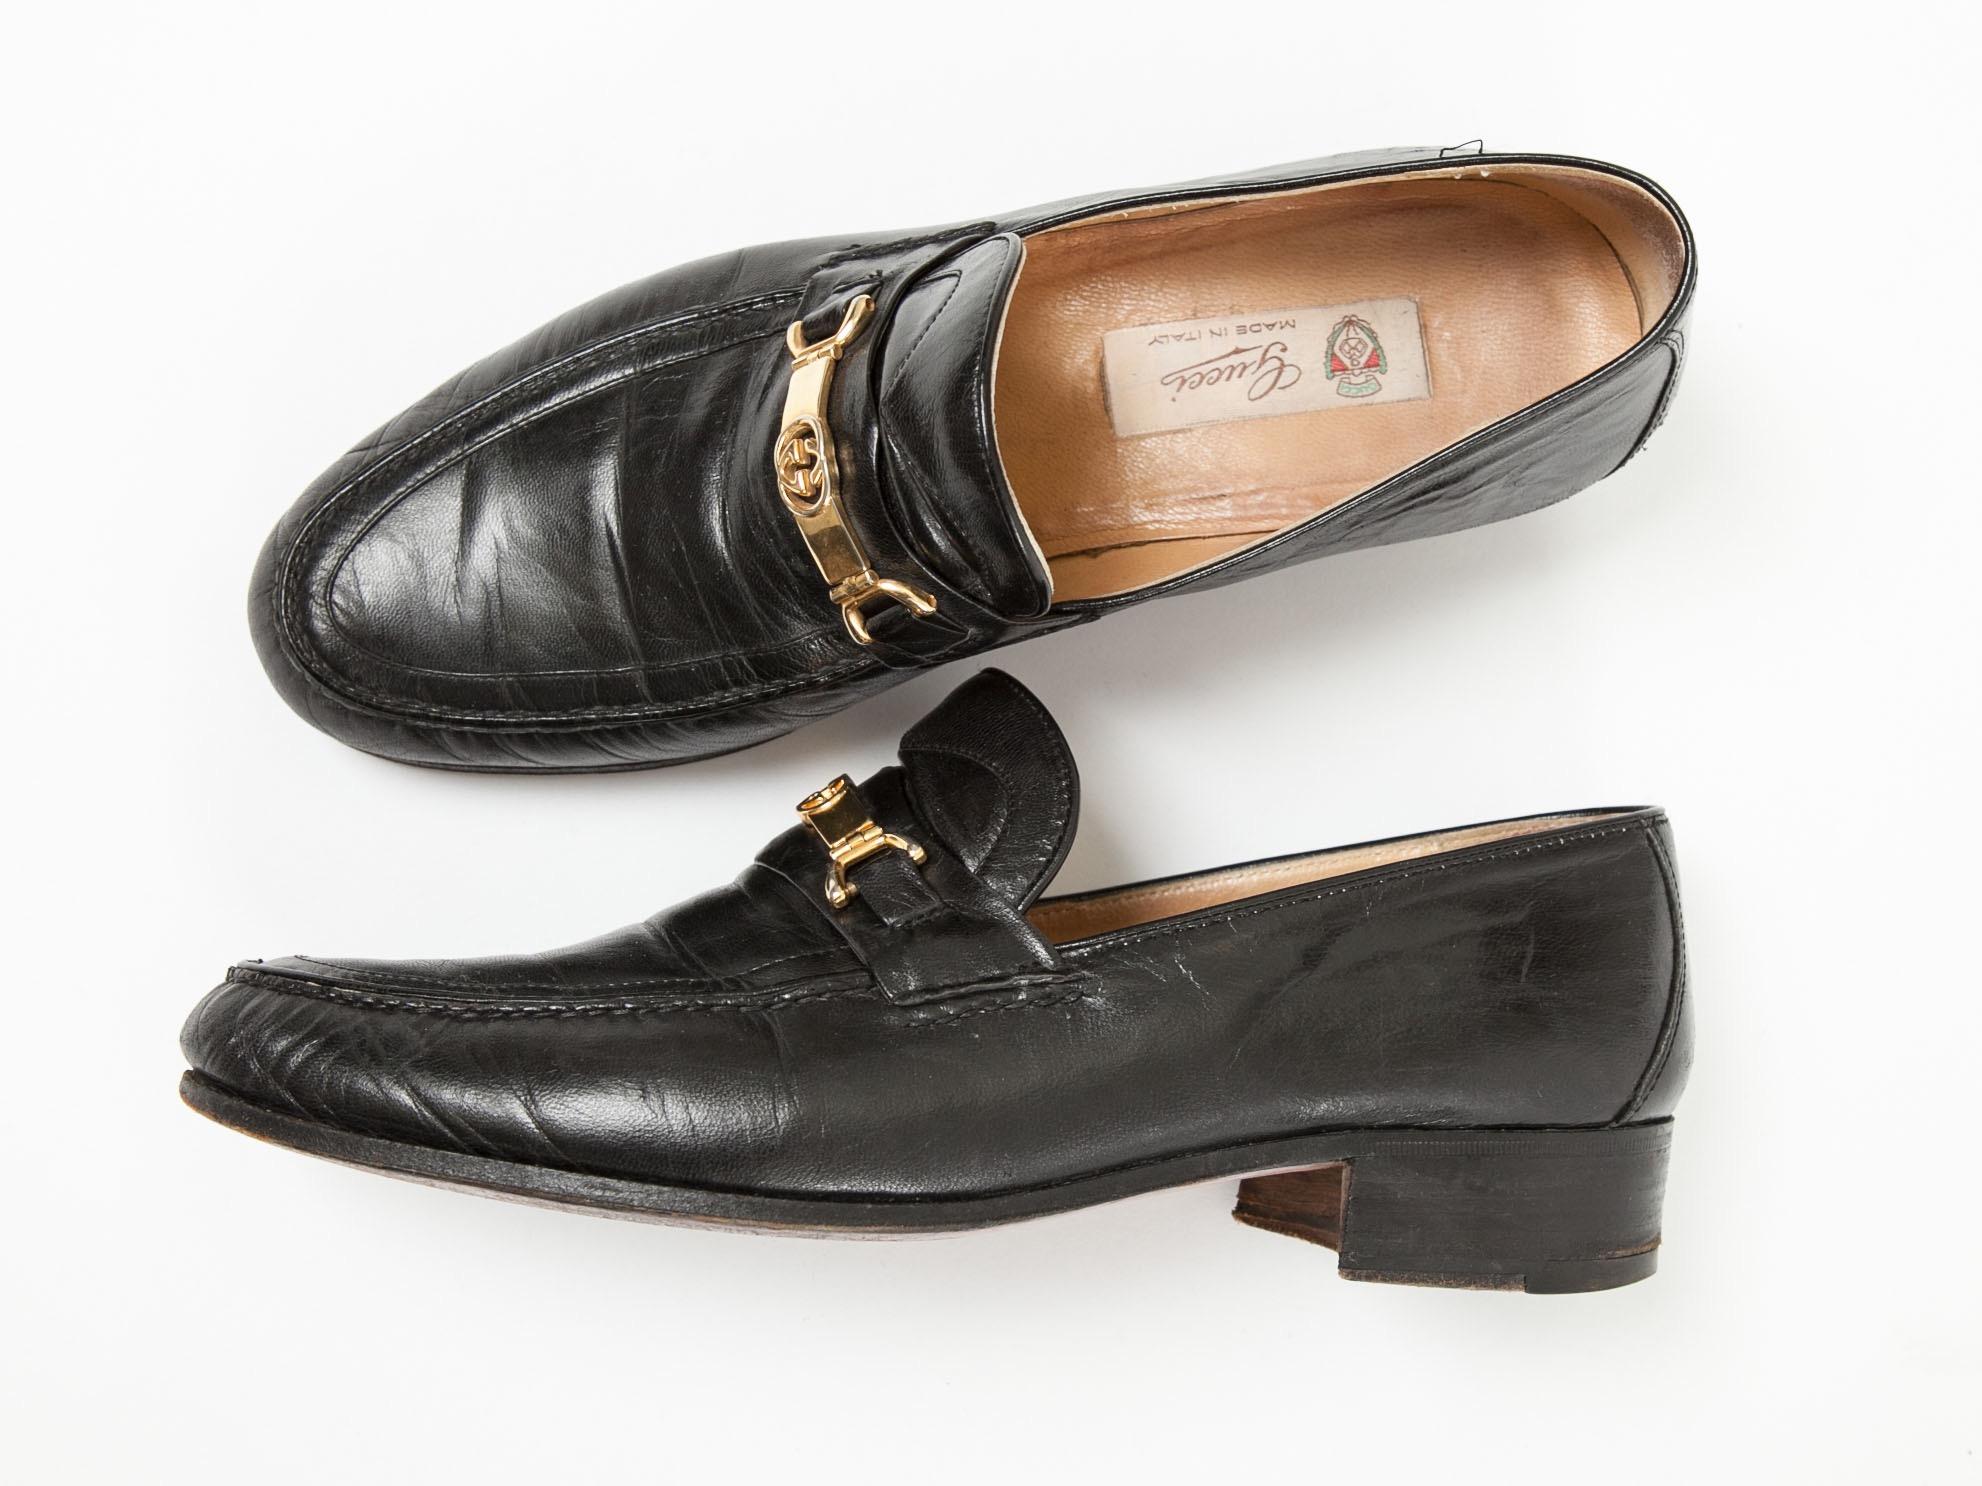 gucci shoes_devora__MG_8056.jpg